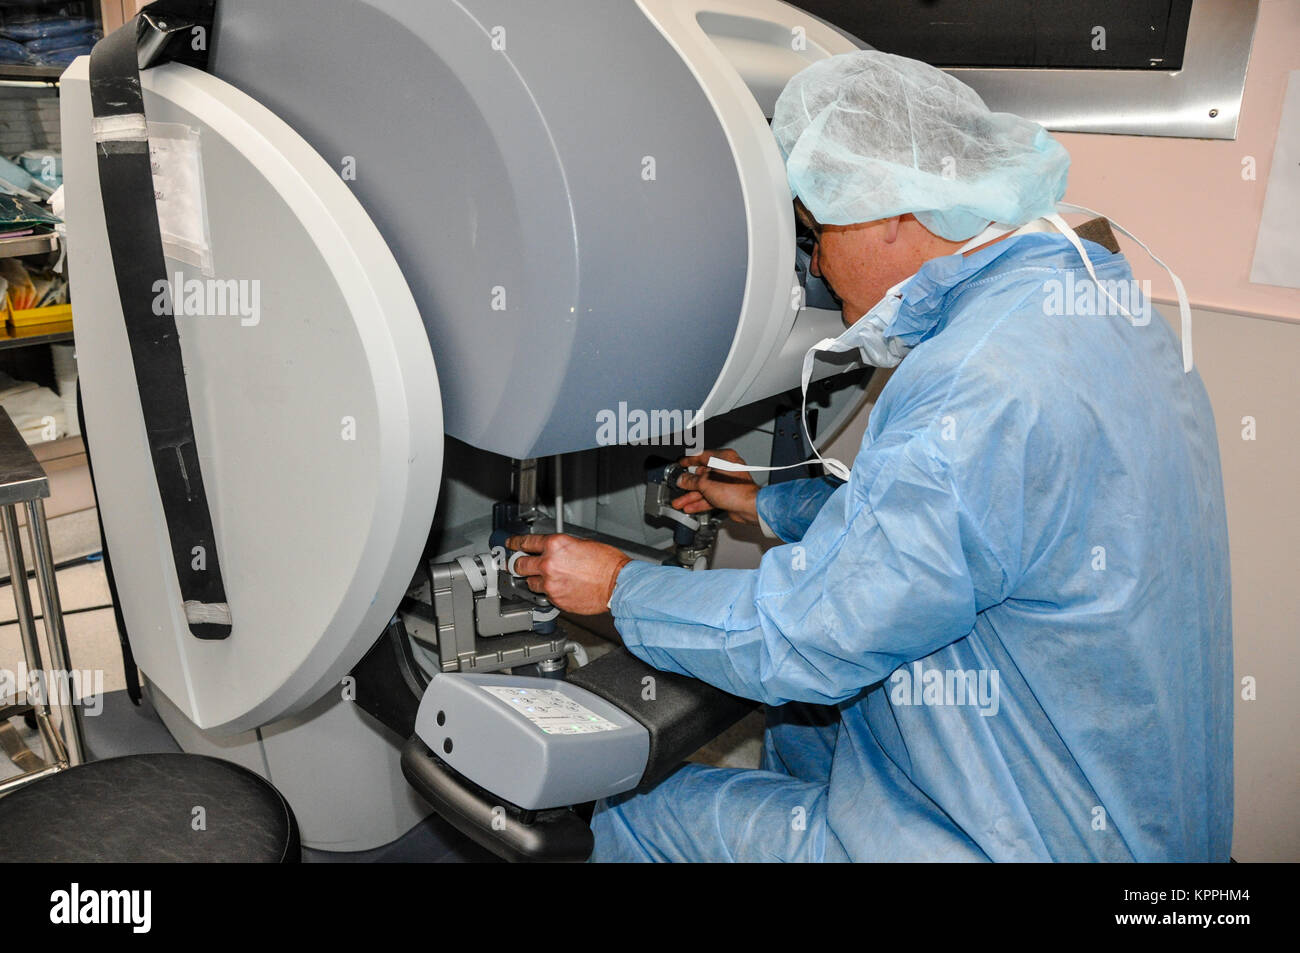 Robotics and Minimally Invasive Surgery